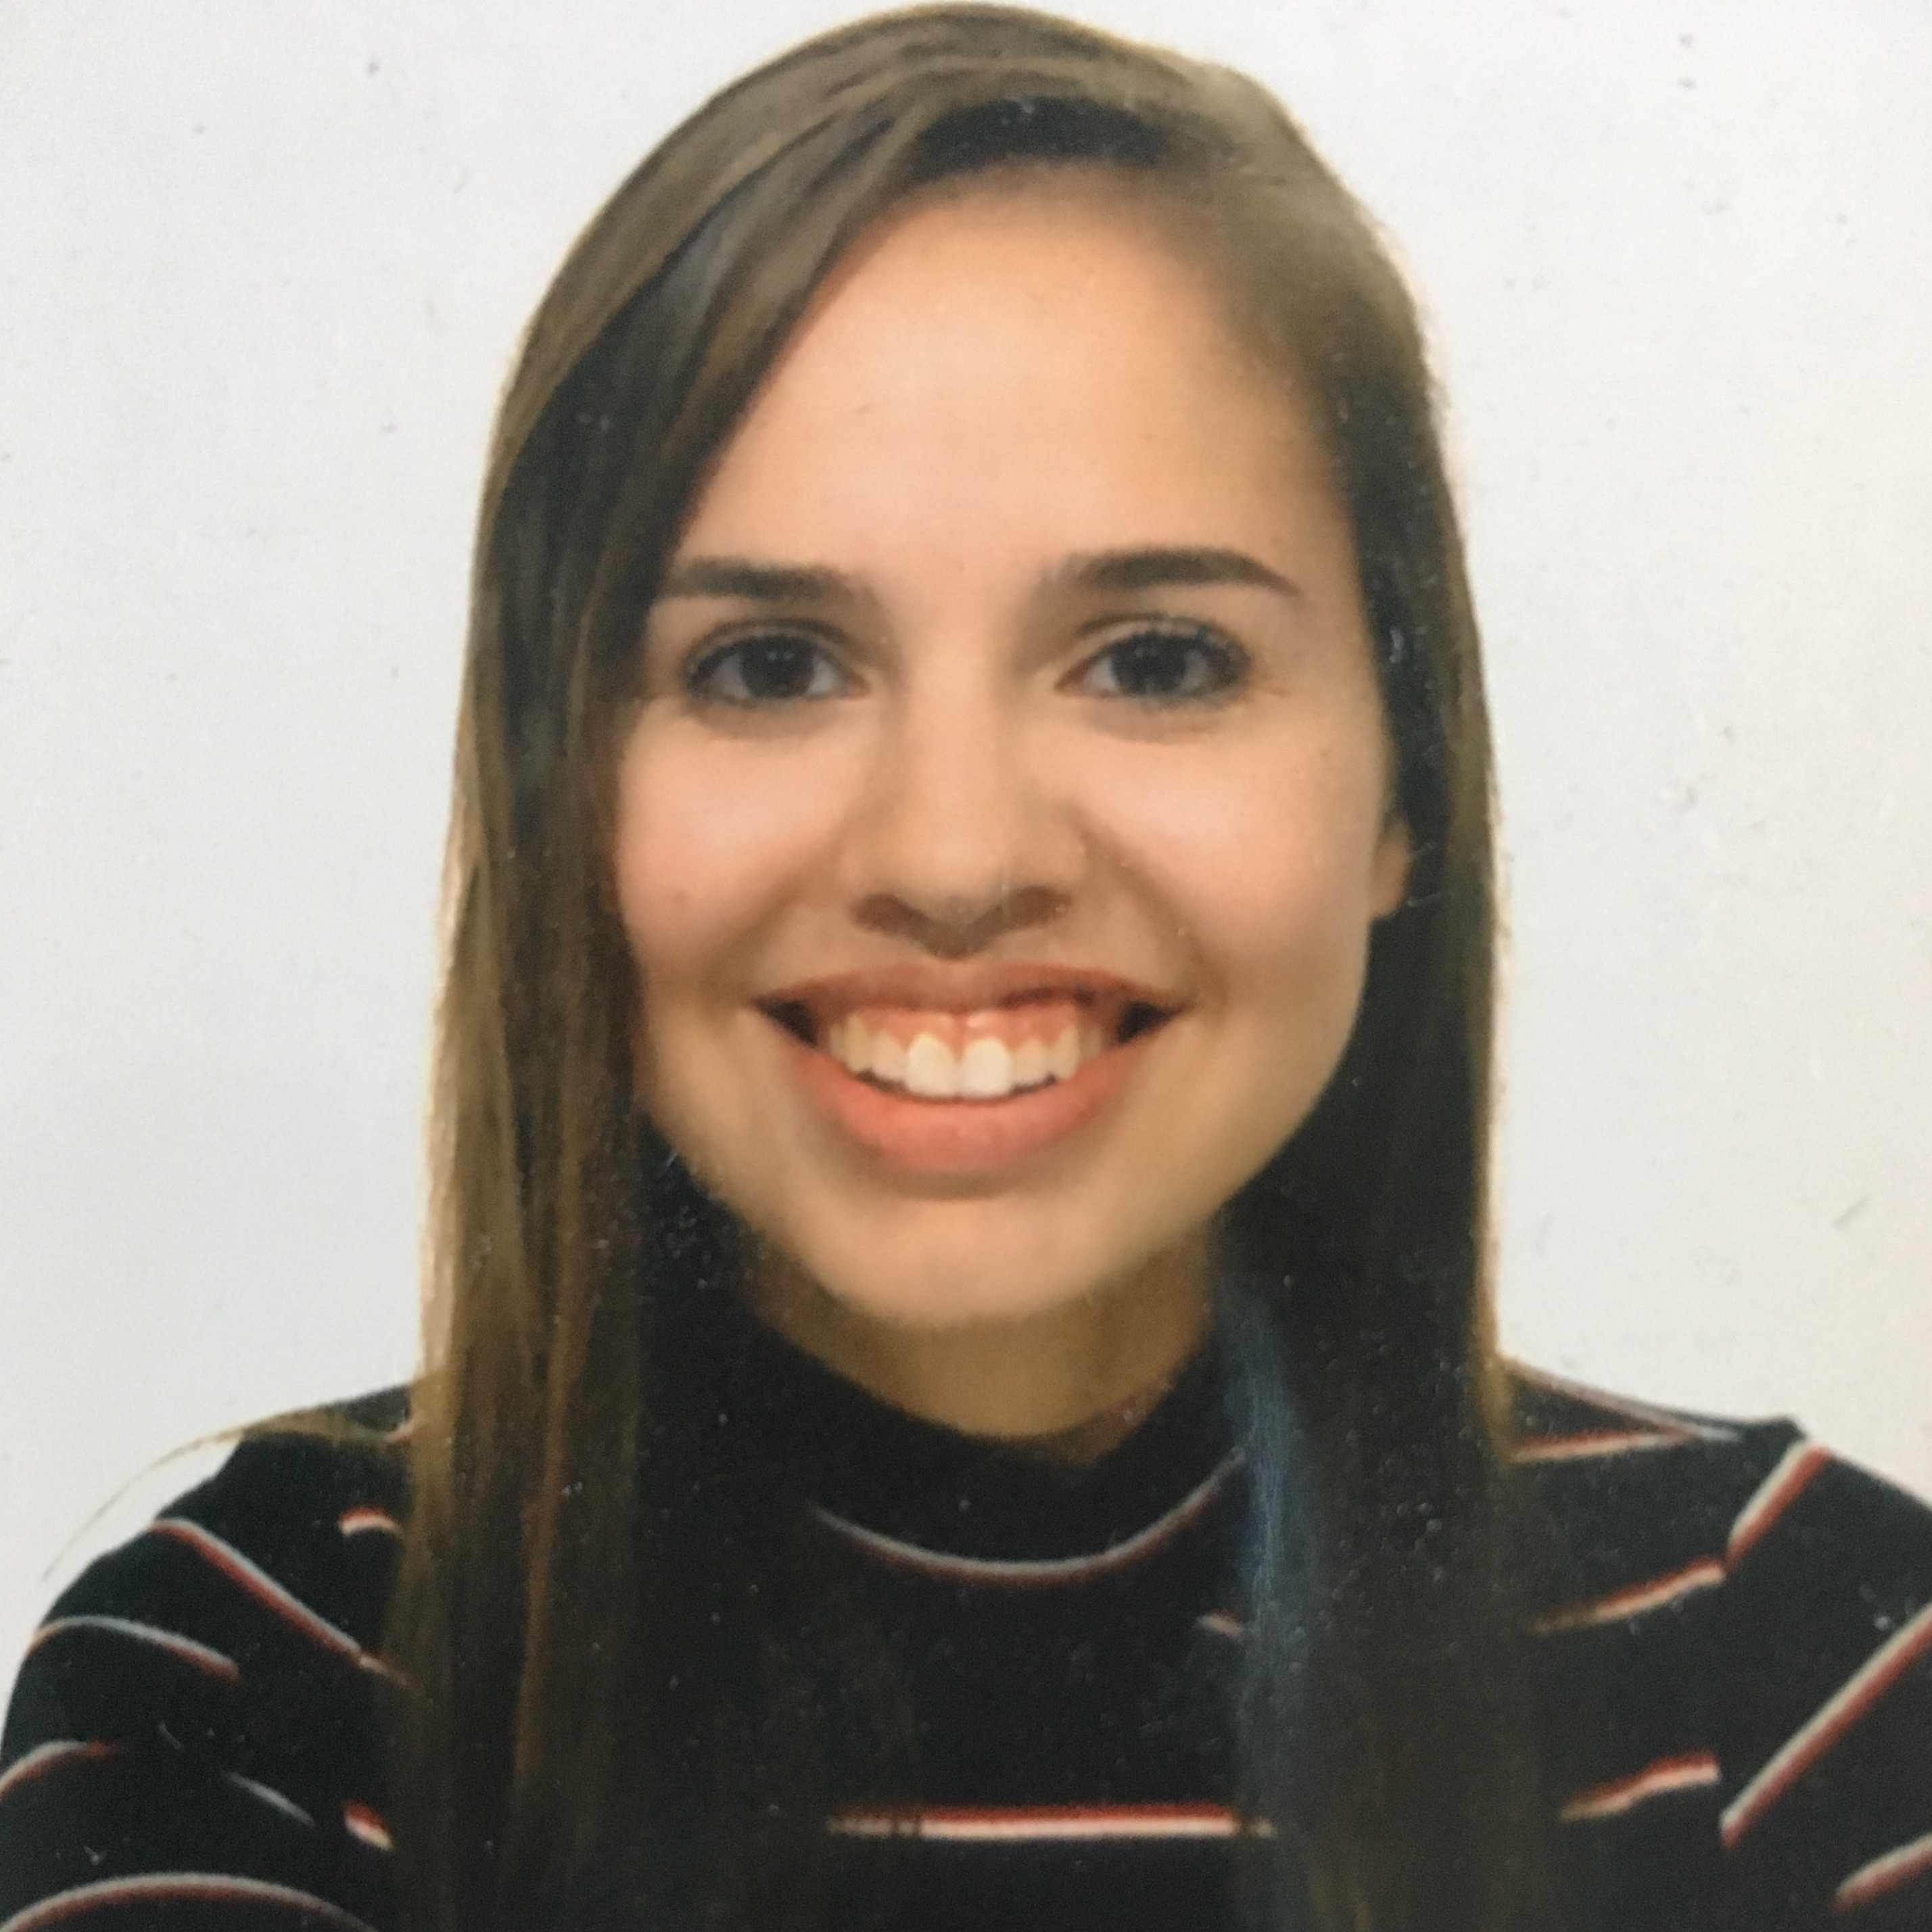 Camille Morales-Zayas